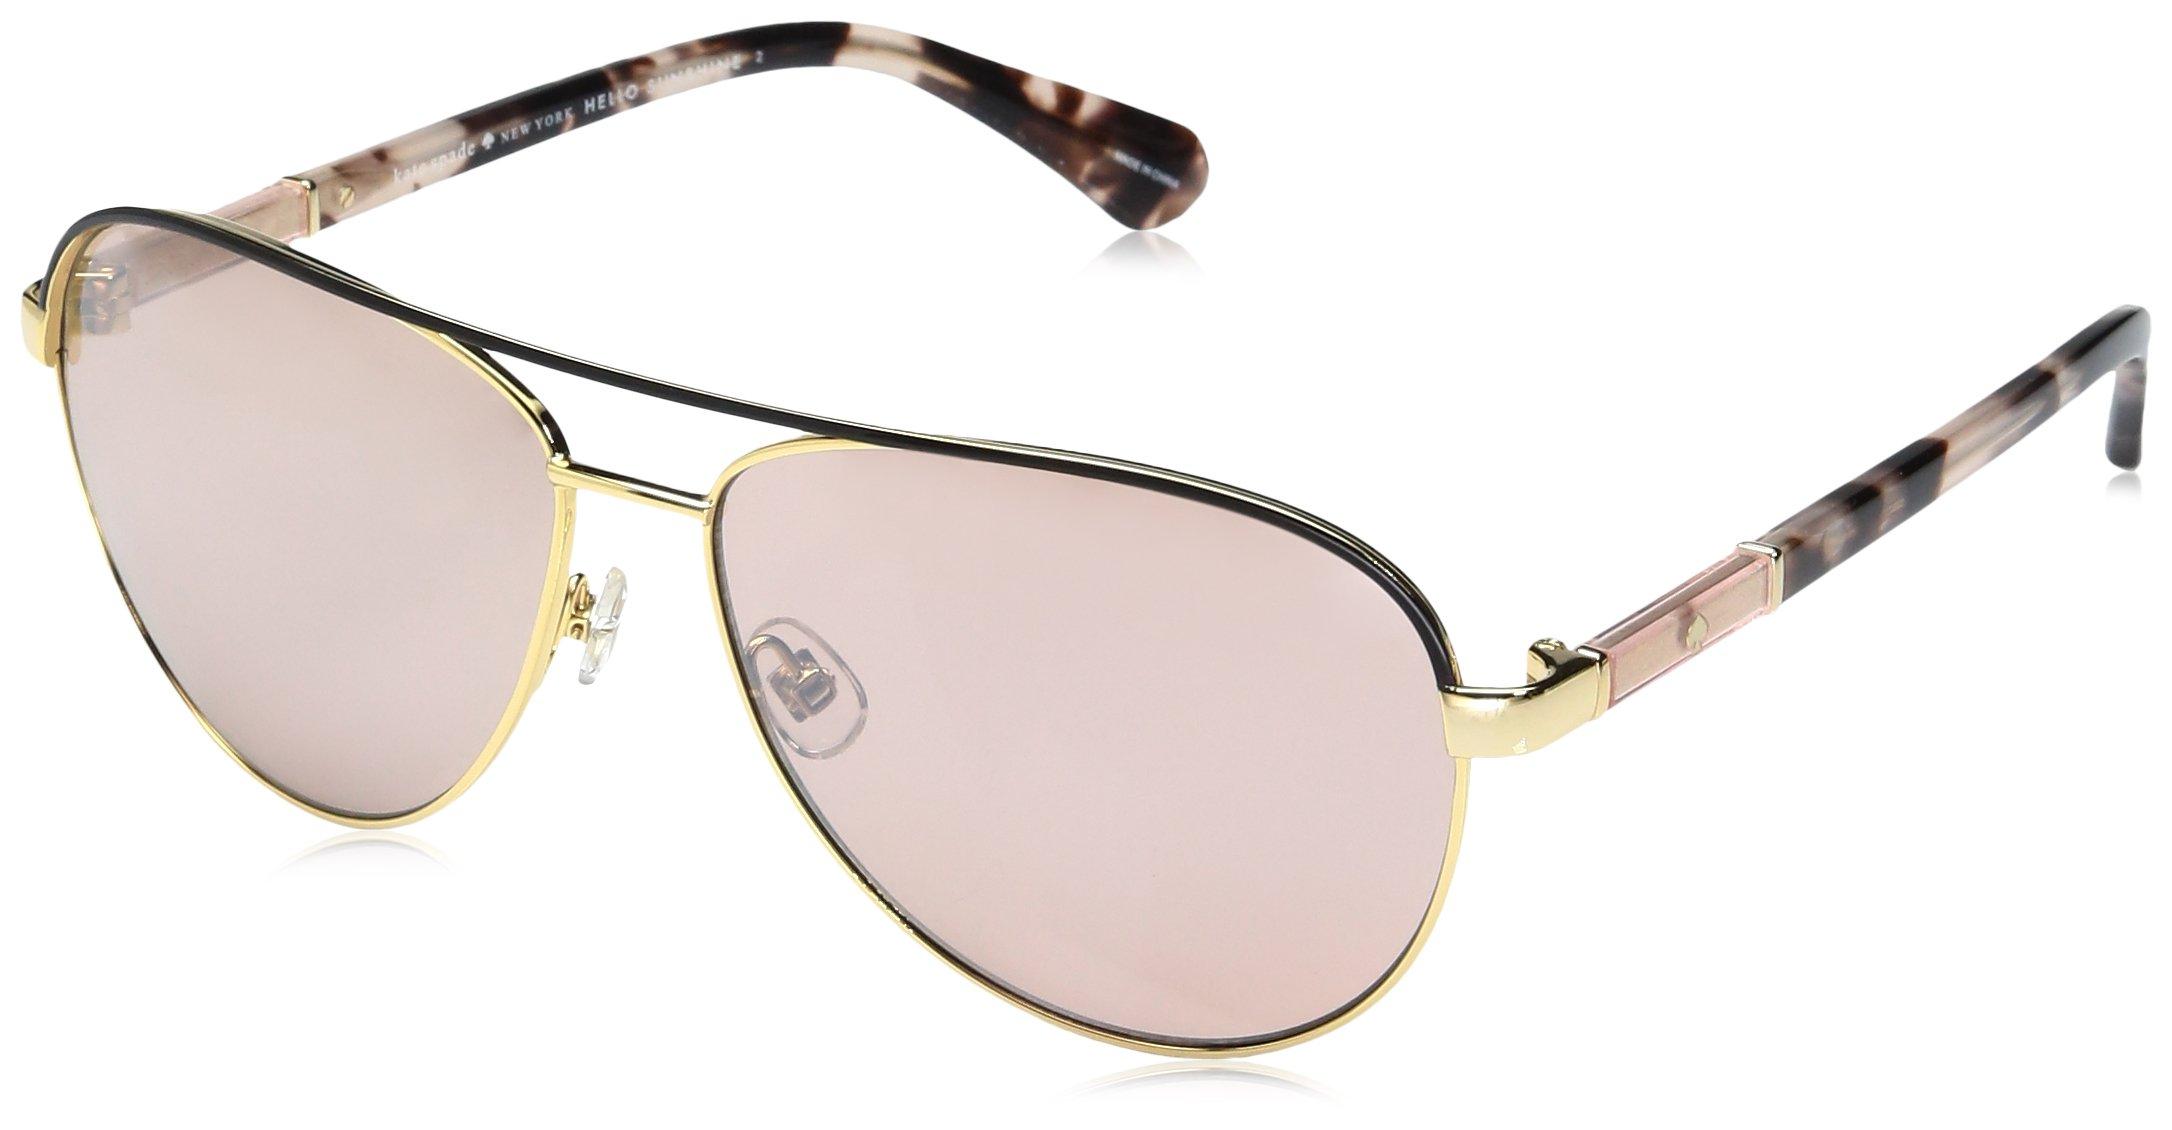 Kate Spade Women's Emilyann/s Aviator Sunglasses, Gold Plum Havana/Pink Flash Silver, 59 mm by Kate Spade New York